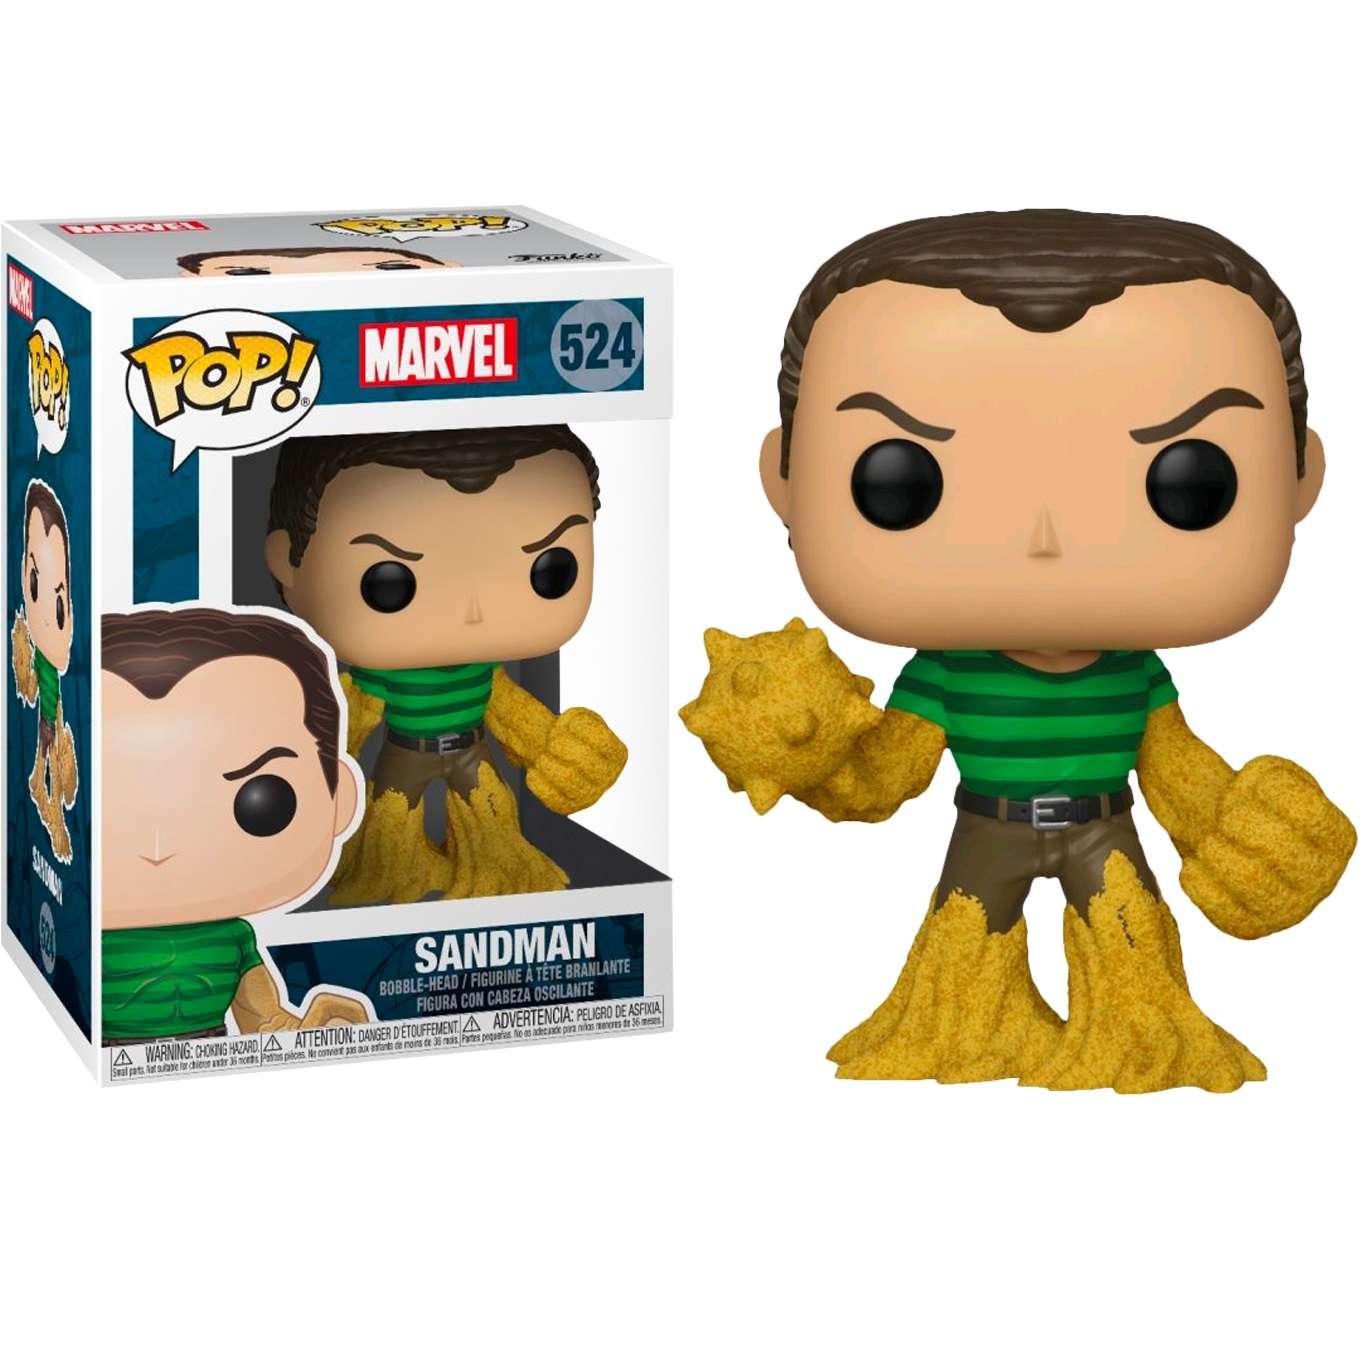 POP!: Marvel - Sandman (Exclusive) Photo